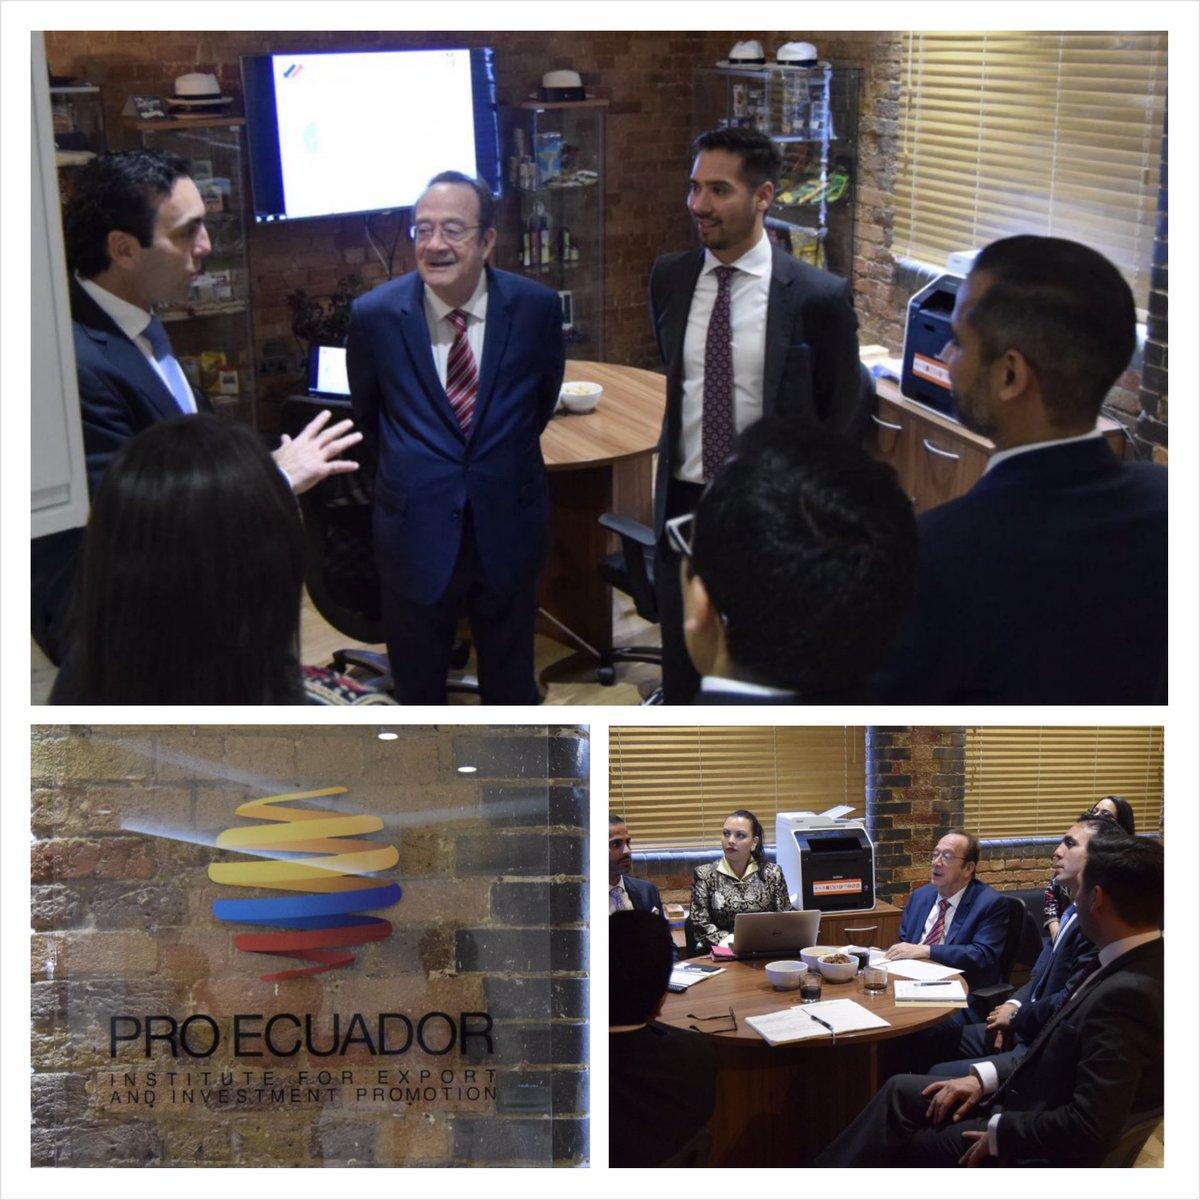 Minister @CampanaPablo , @EmbajadaEcuUK &amp; @Pro_Ecuador have a work meeting in #London - #Ecuador #investment #promotion @ComercioExtEc<br>http://pic.twitter.com/fshUVkoTQk